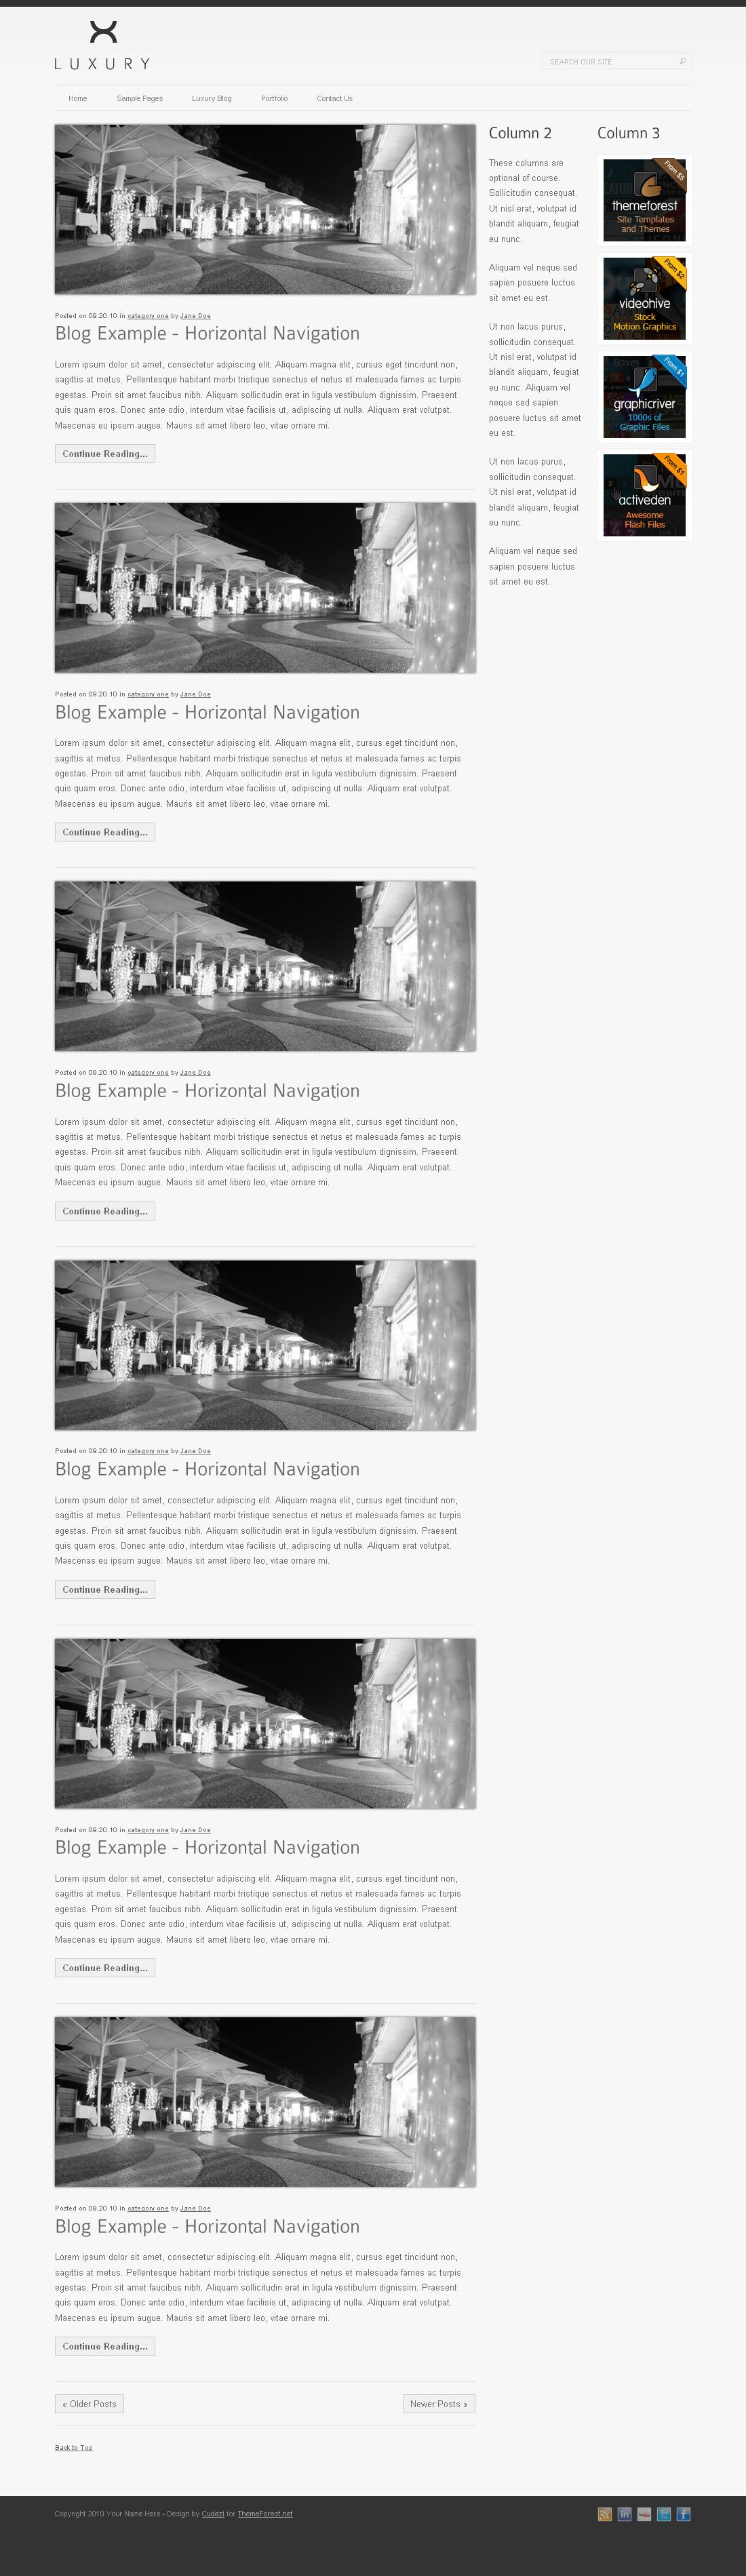 Luxury HTML Template by Cudazi